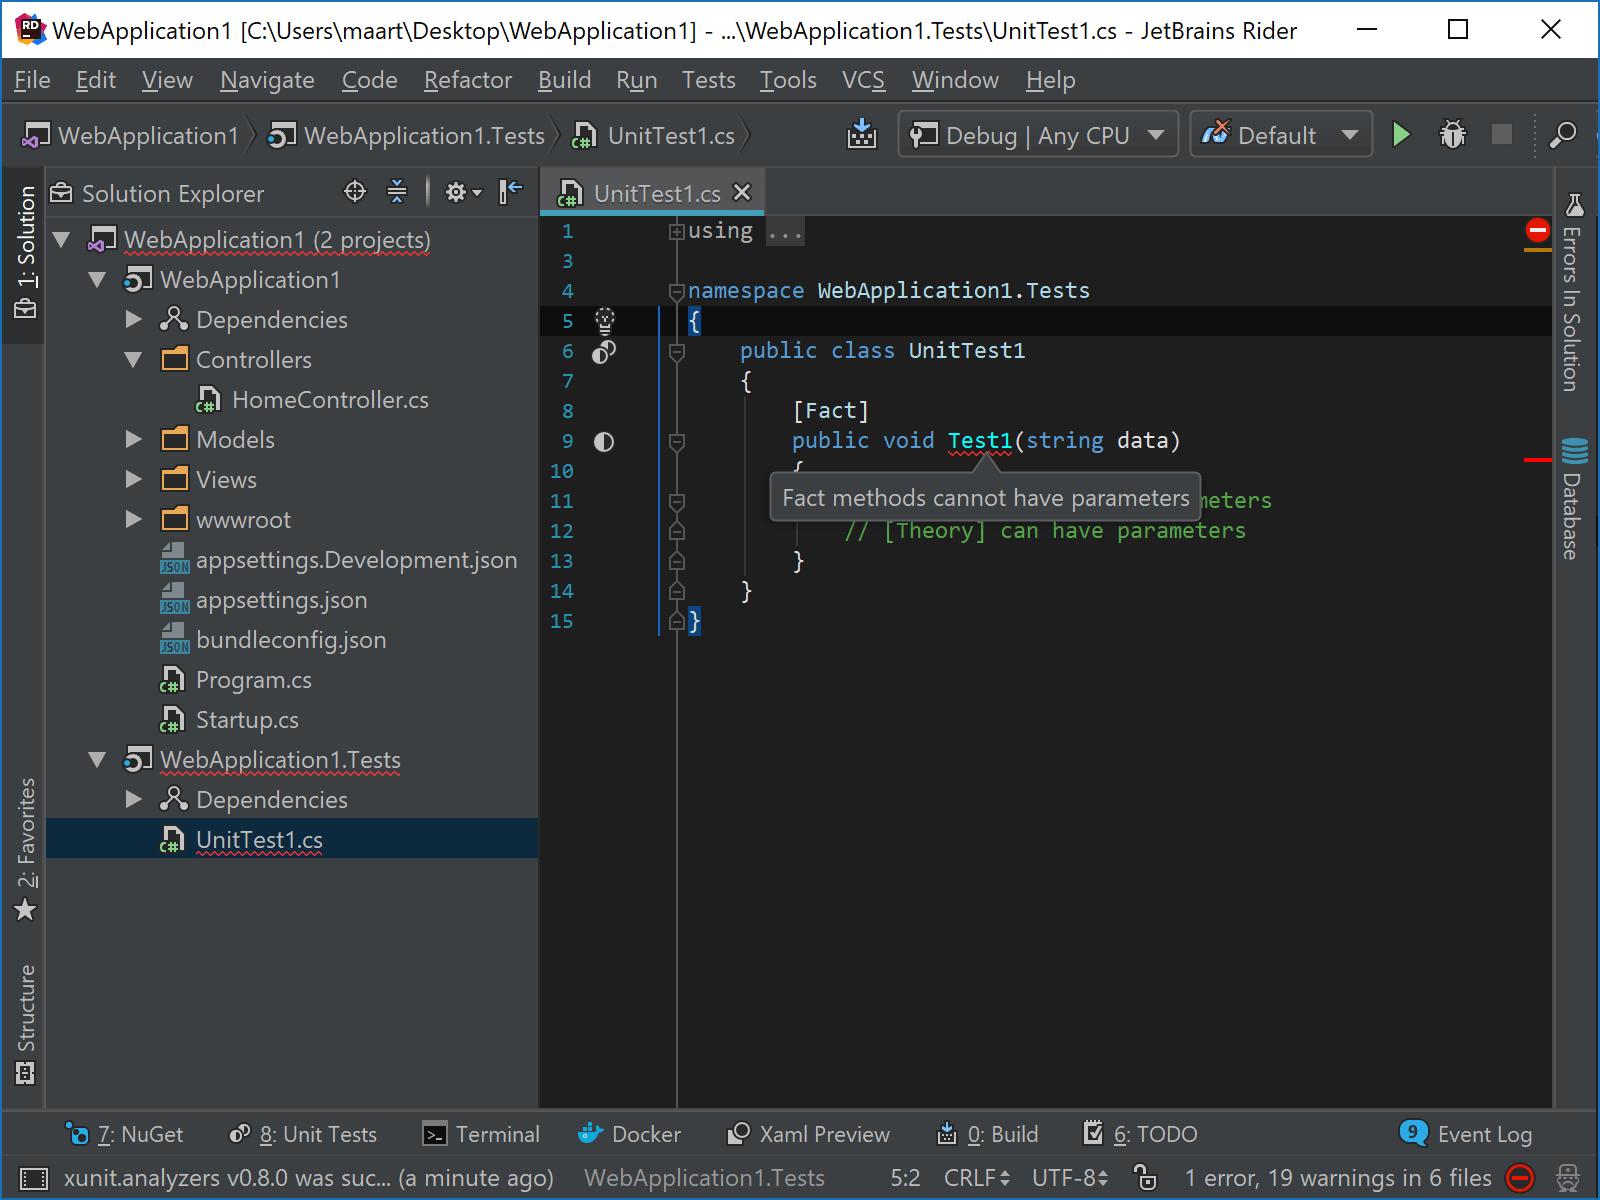 Using xUnit analyzers in JetBrains Rider